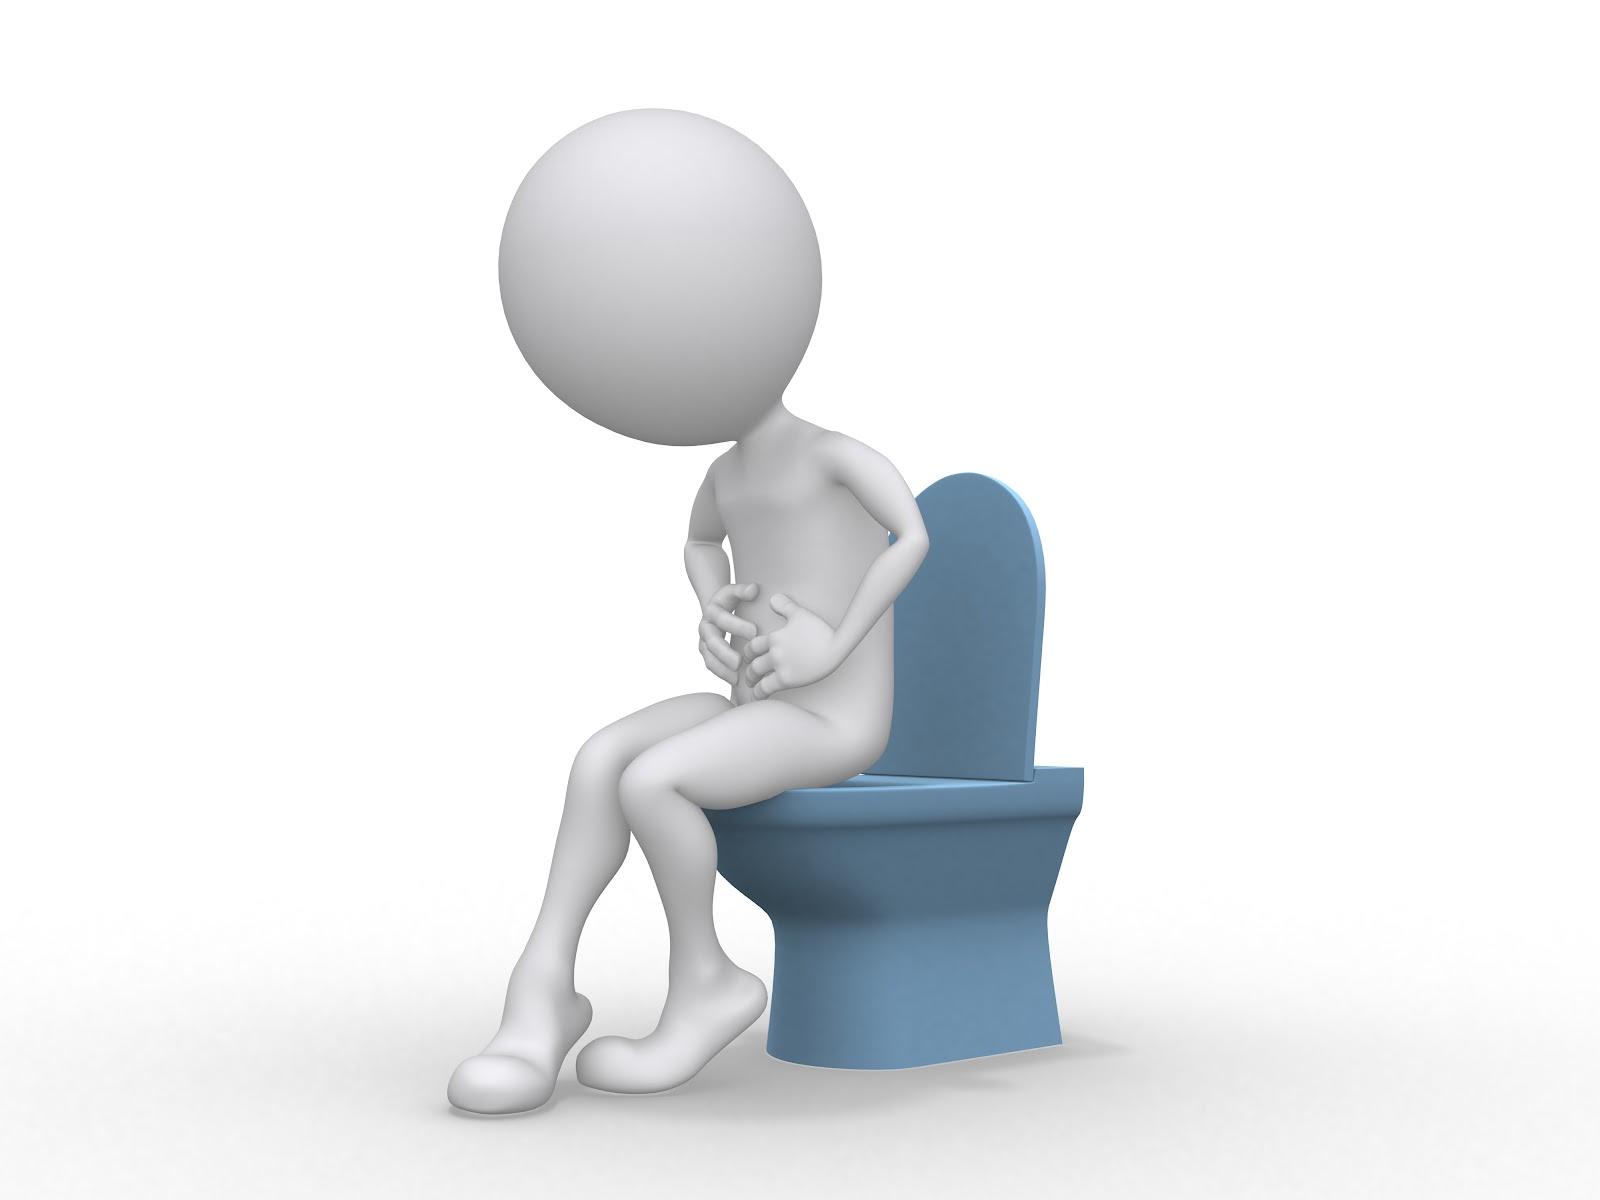 диарея и боли в животе